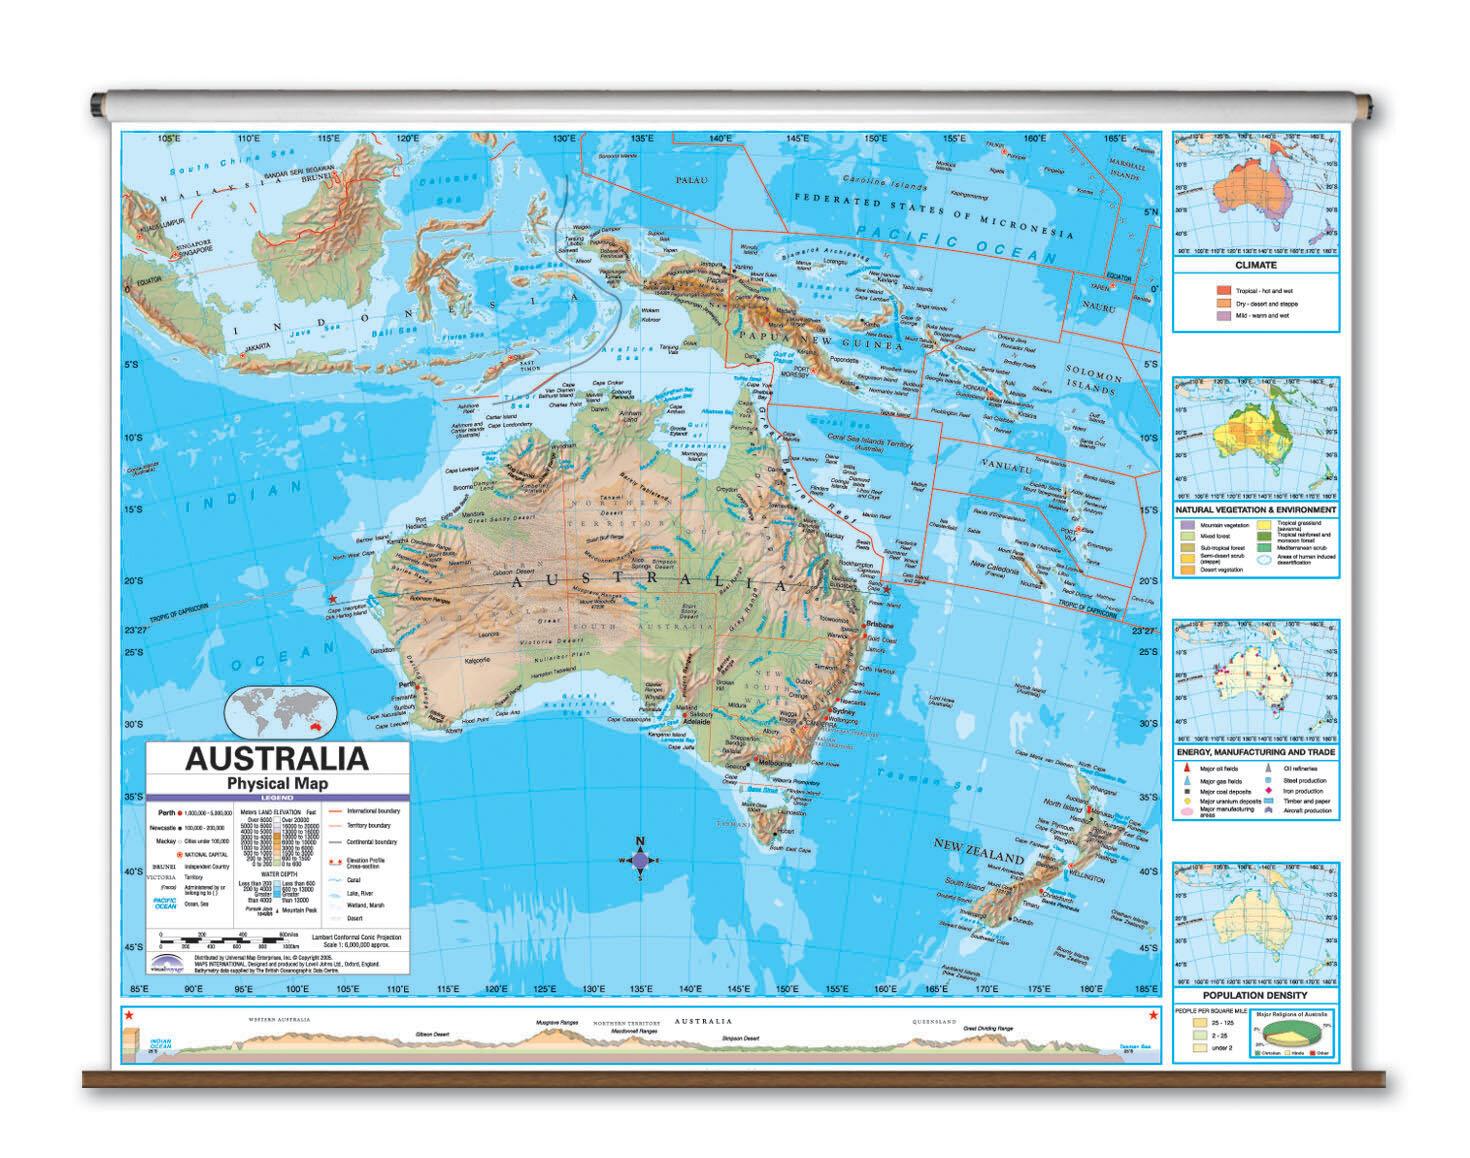 Universal Map Advanced Physical Map - Australia | Wayfair